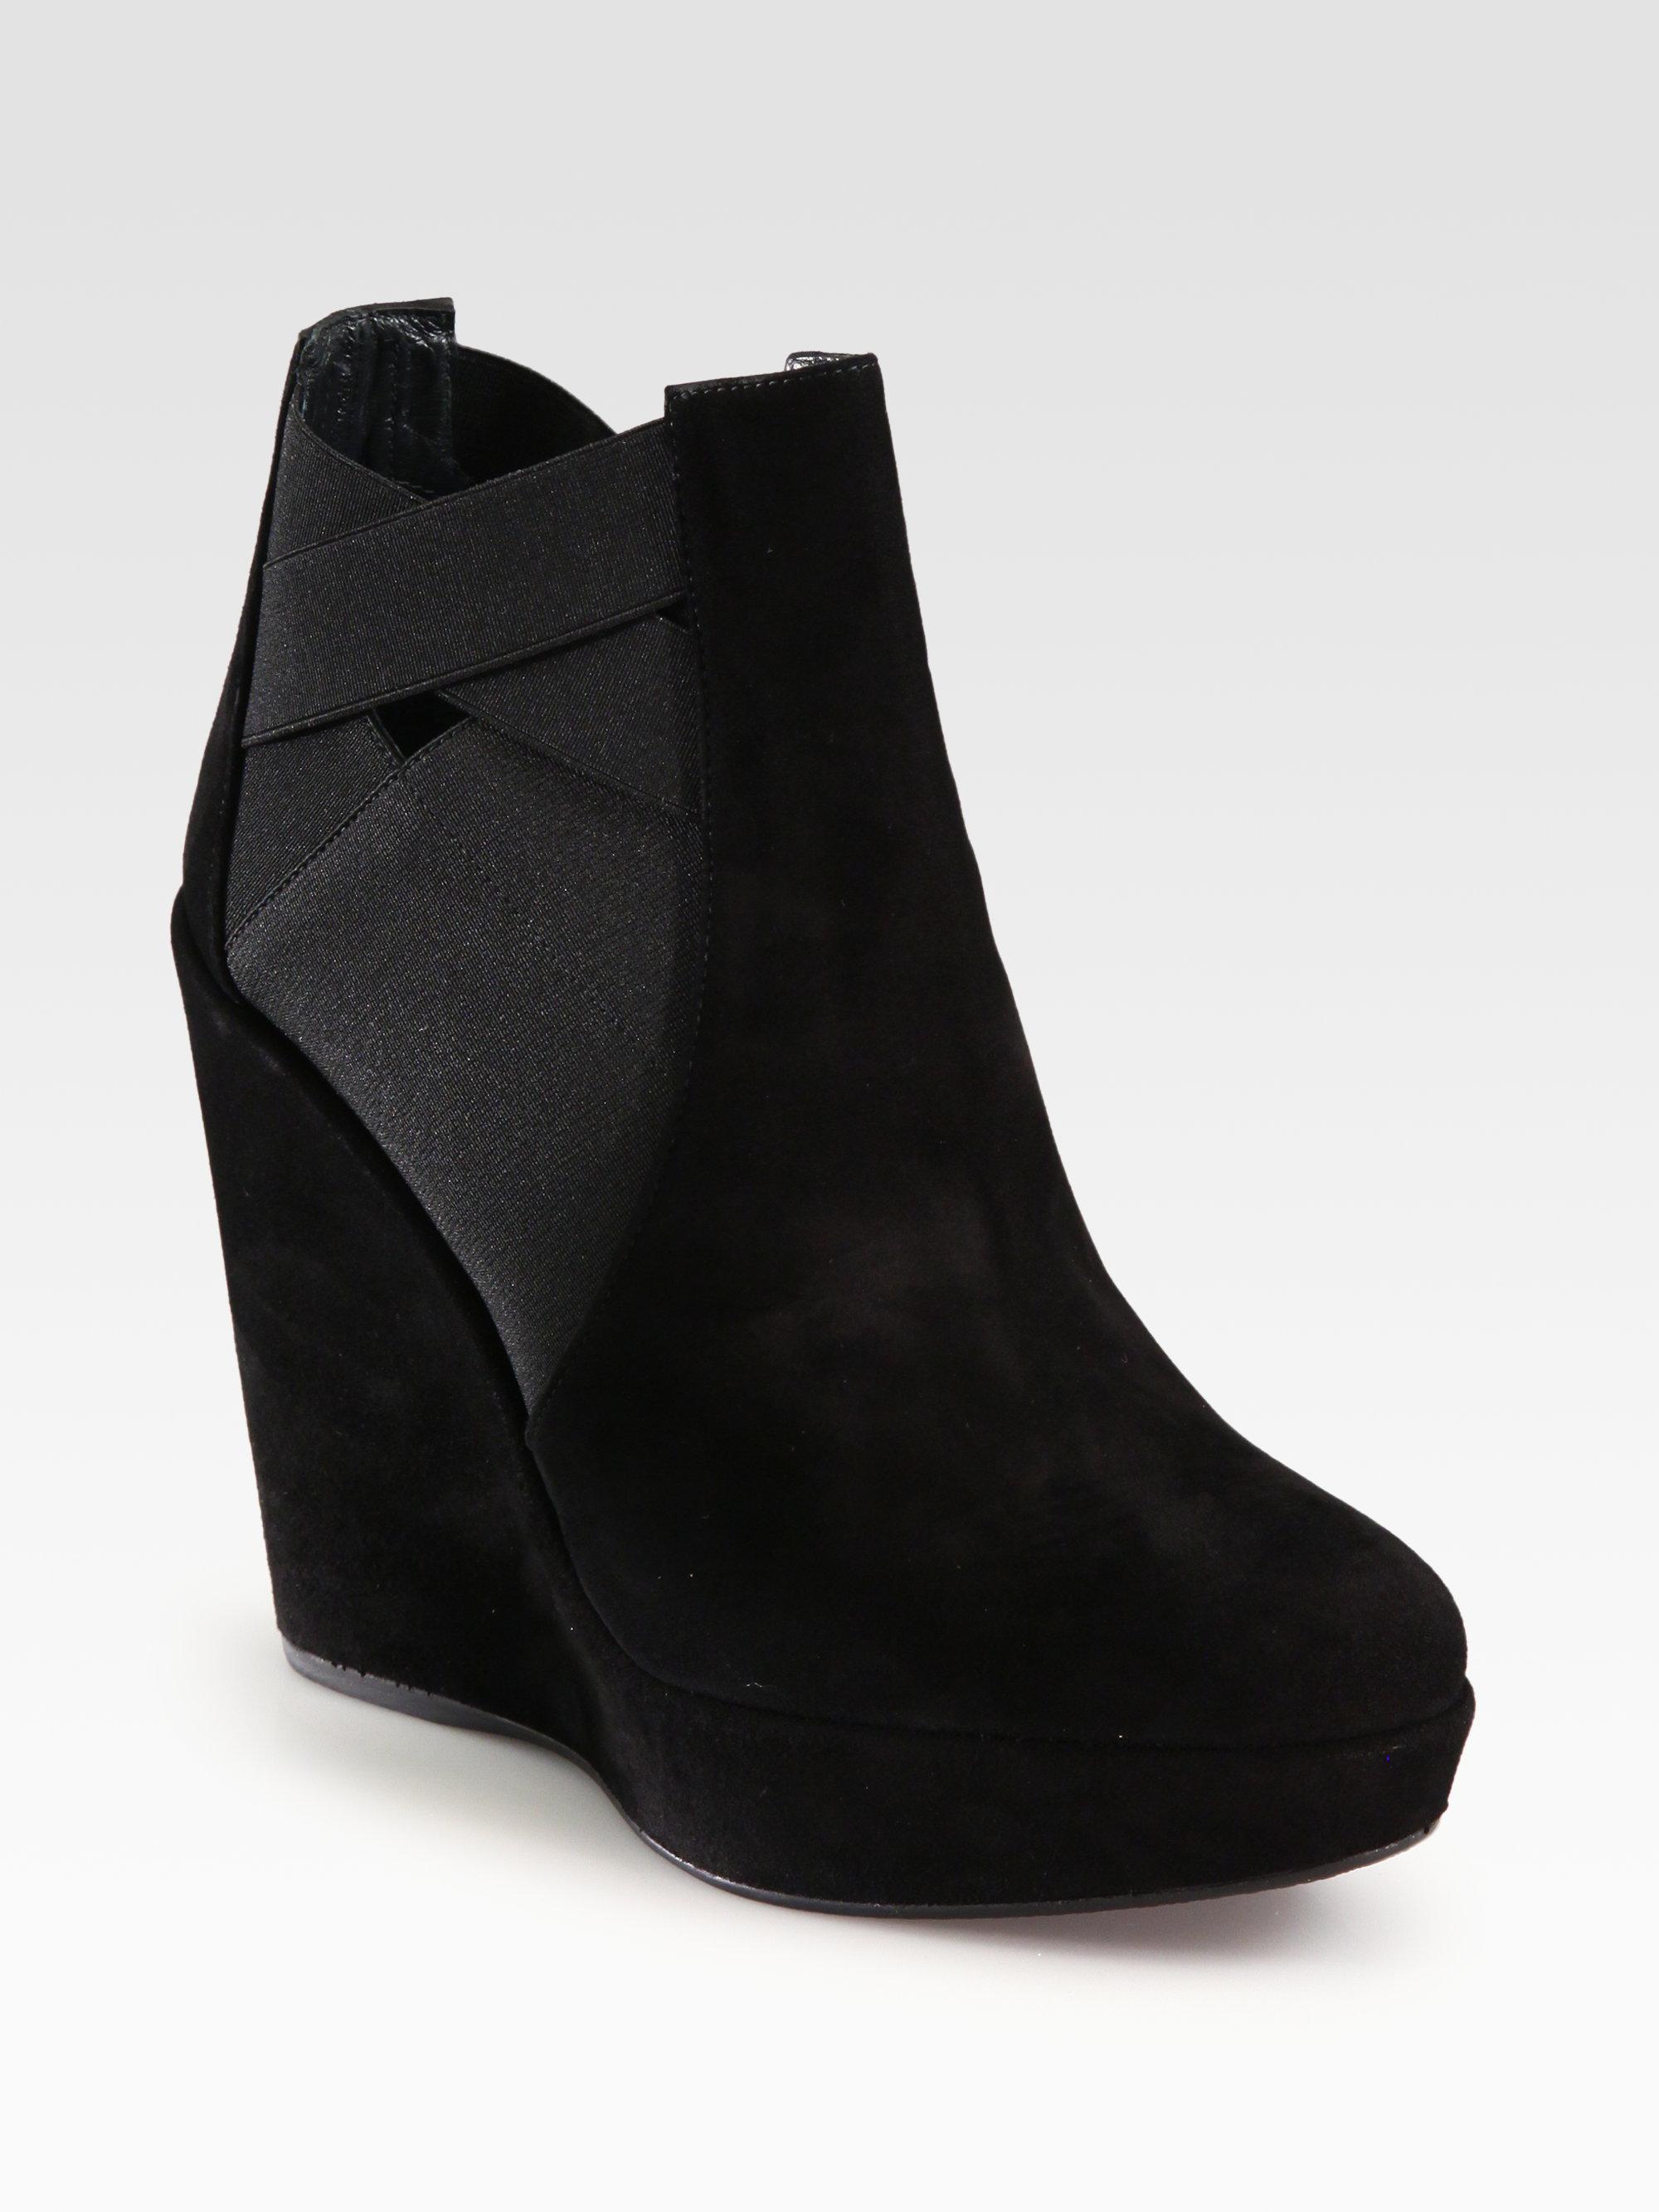 Stuart Weitzman Platform Wedge Ankle Boots latest for sale excellent discount exclusive 9IQNhcN